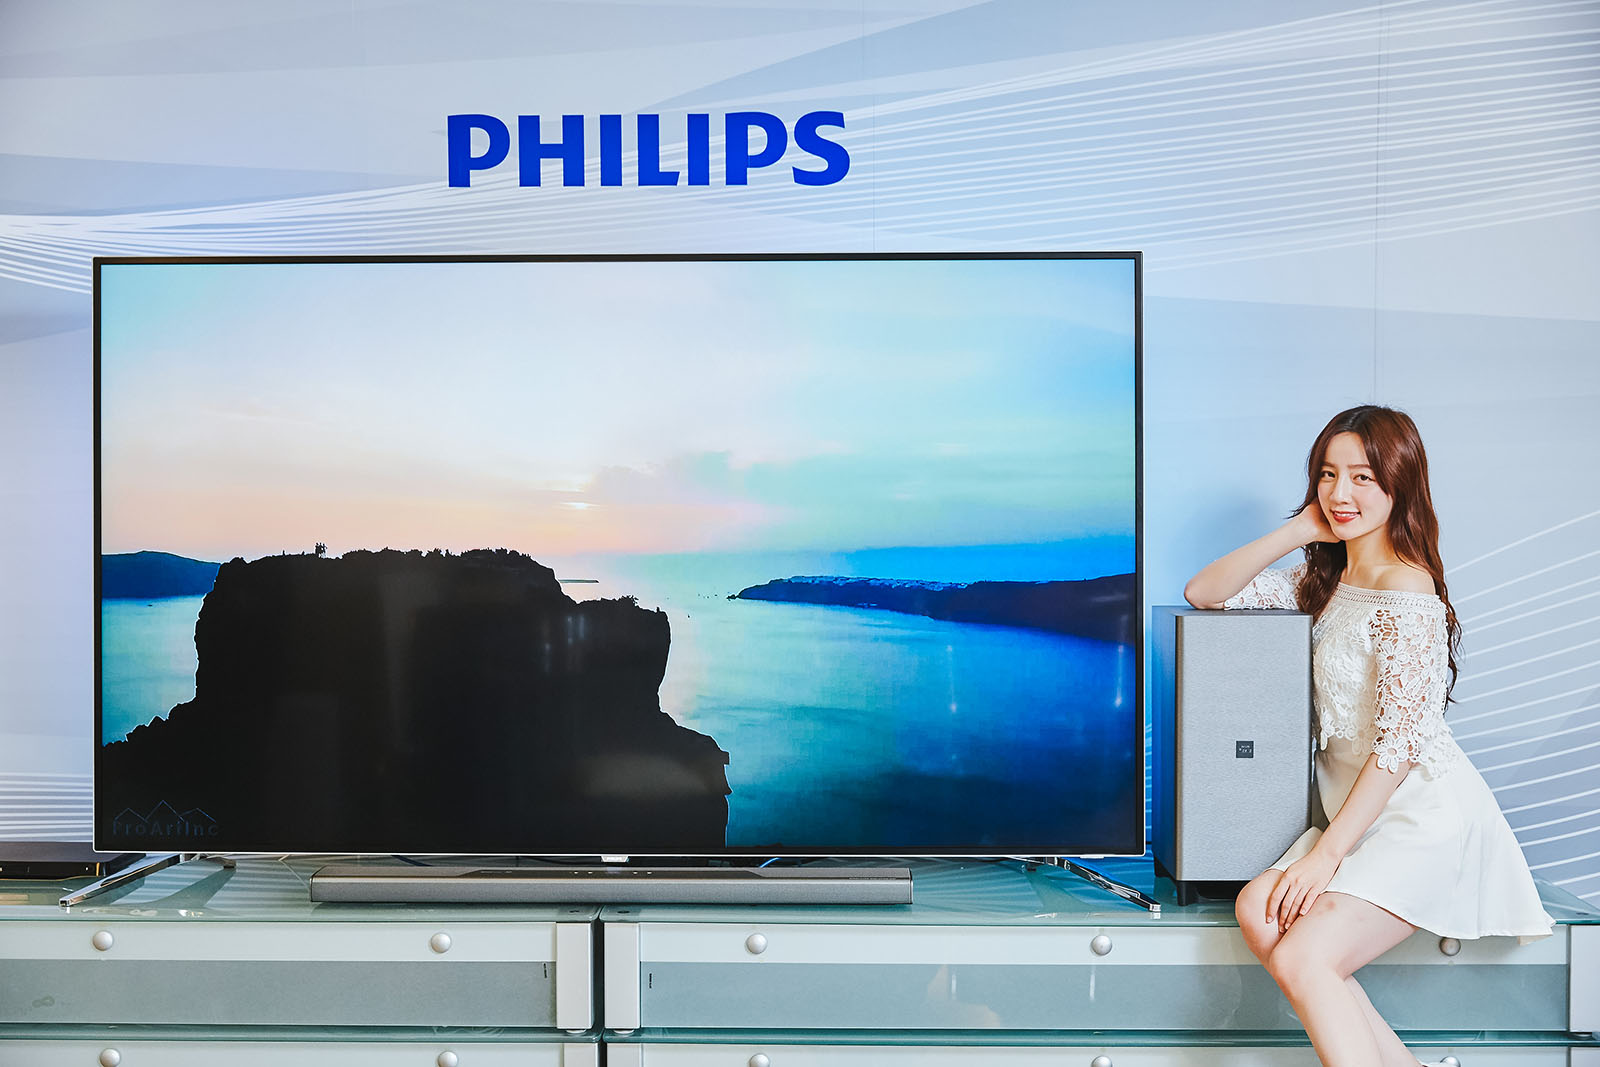 PHILIPS 影音雙旗艦,超大視野 86 吋大型顯示器 86PUH8504 / 極勁音頻 Fidelio B8 聲霸劇院音響搶先評測